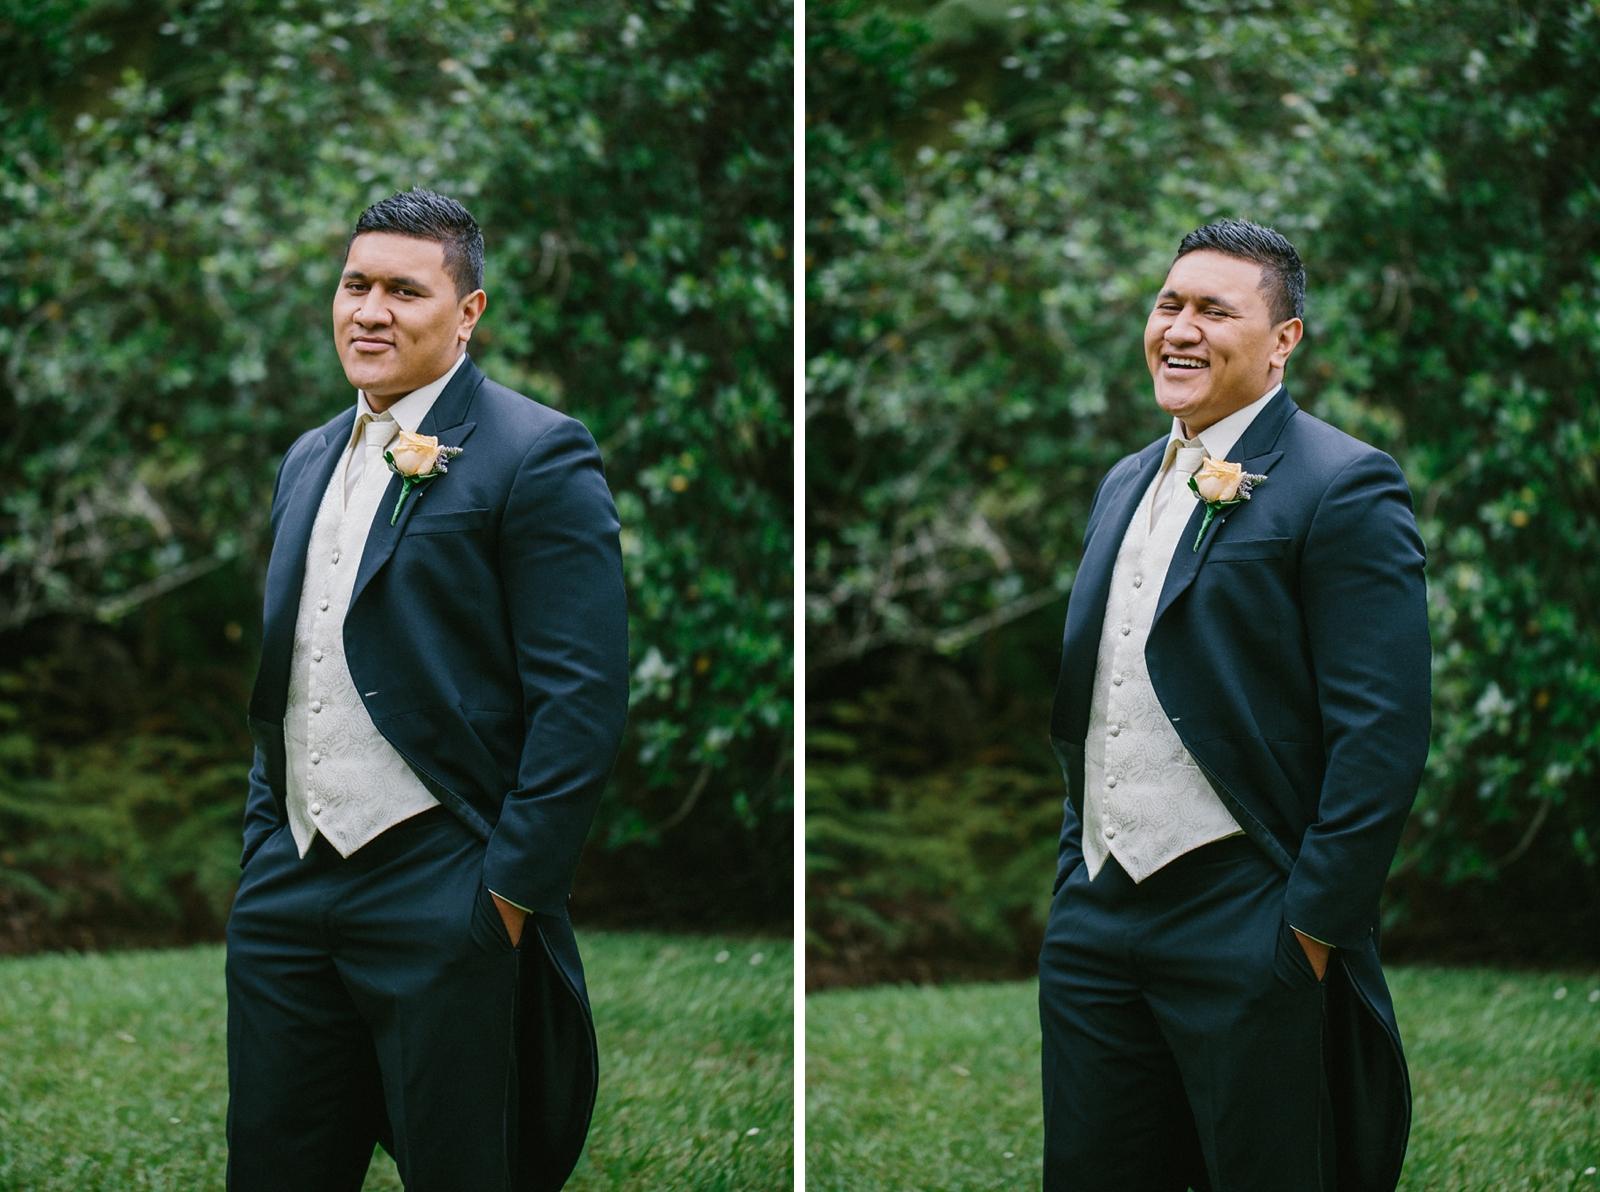 GabbyFiti_Auckland Wedding Photographer_Patty Lagera_0050.jpg